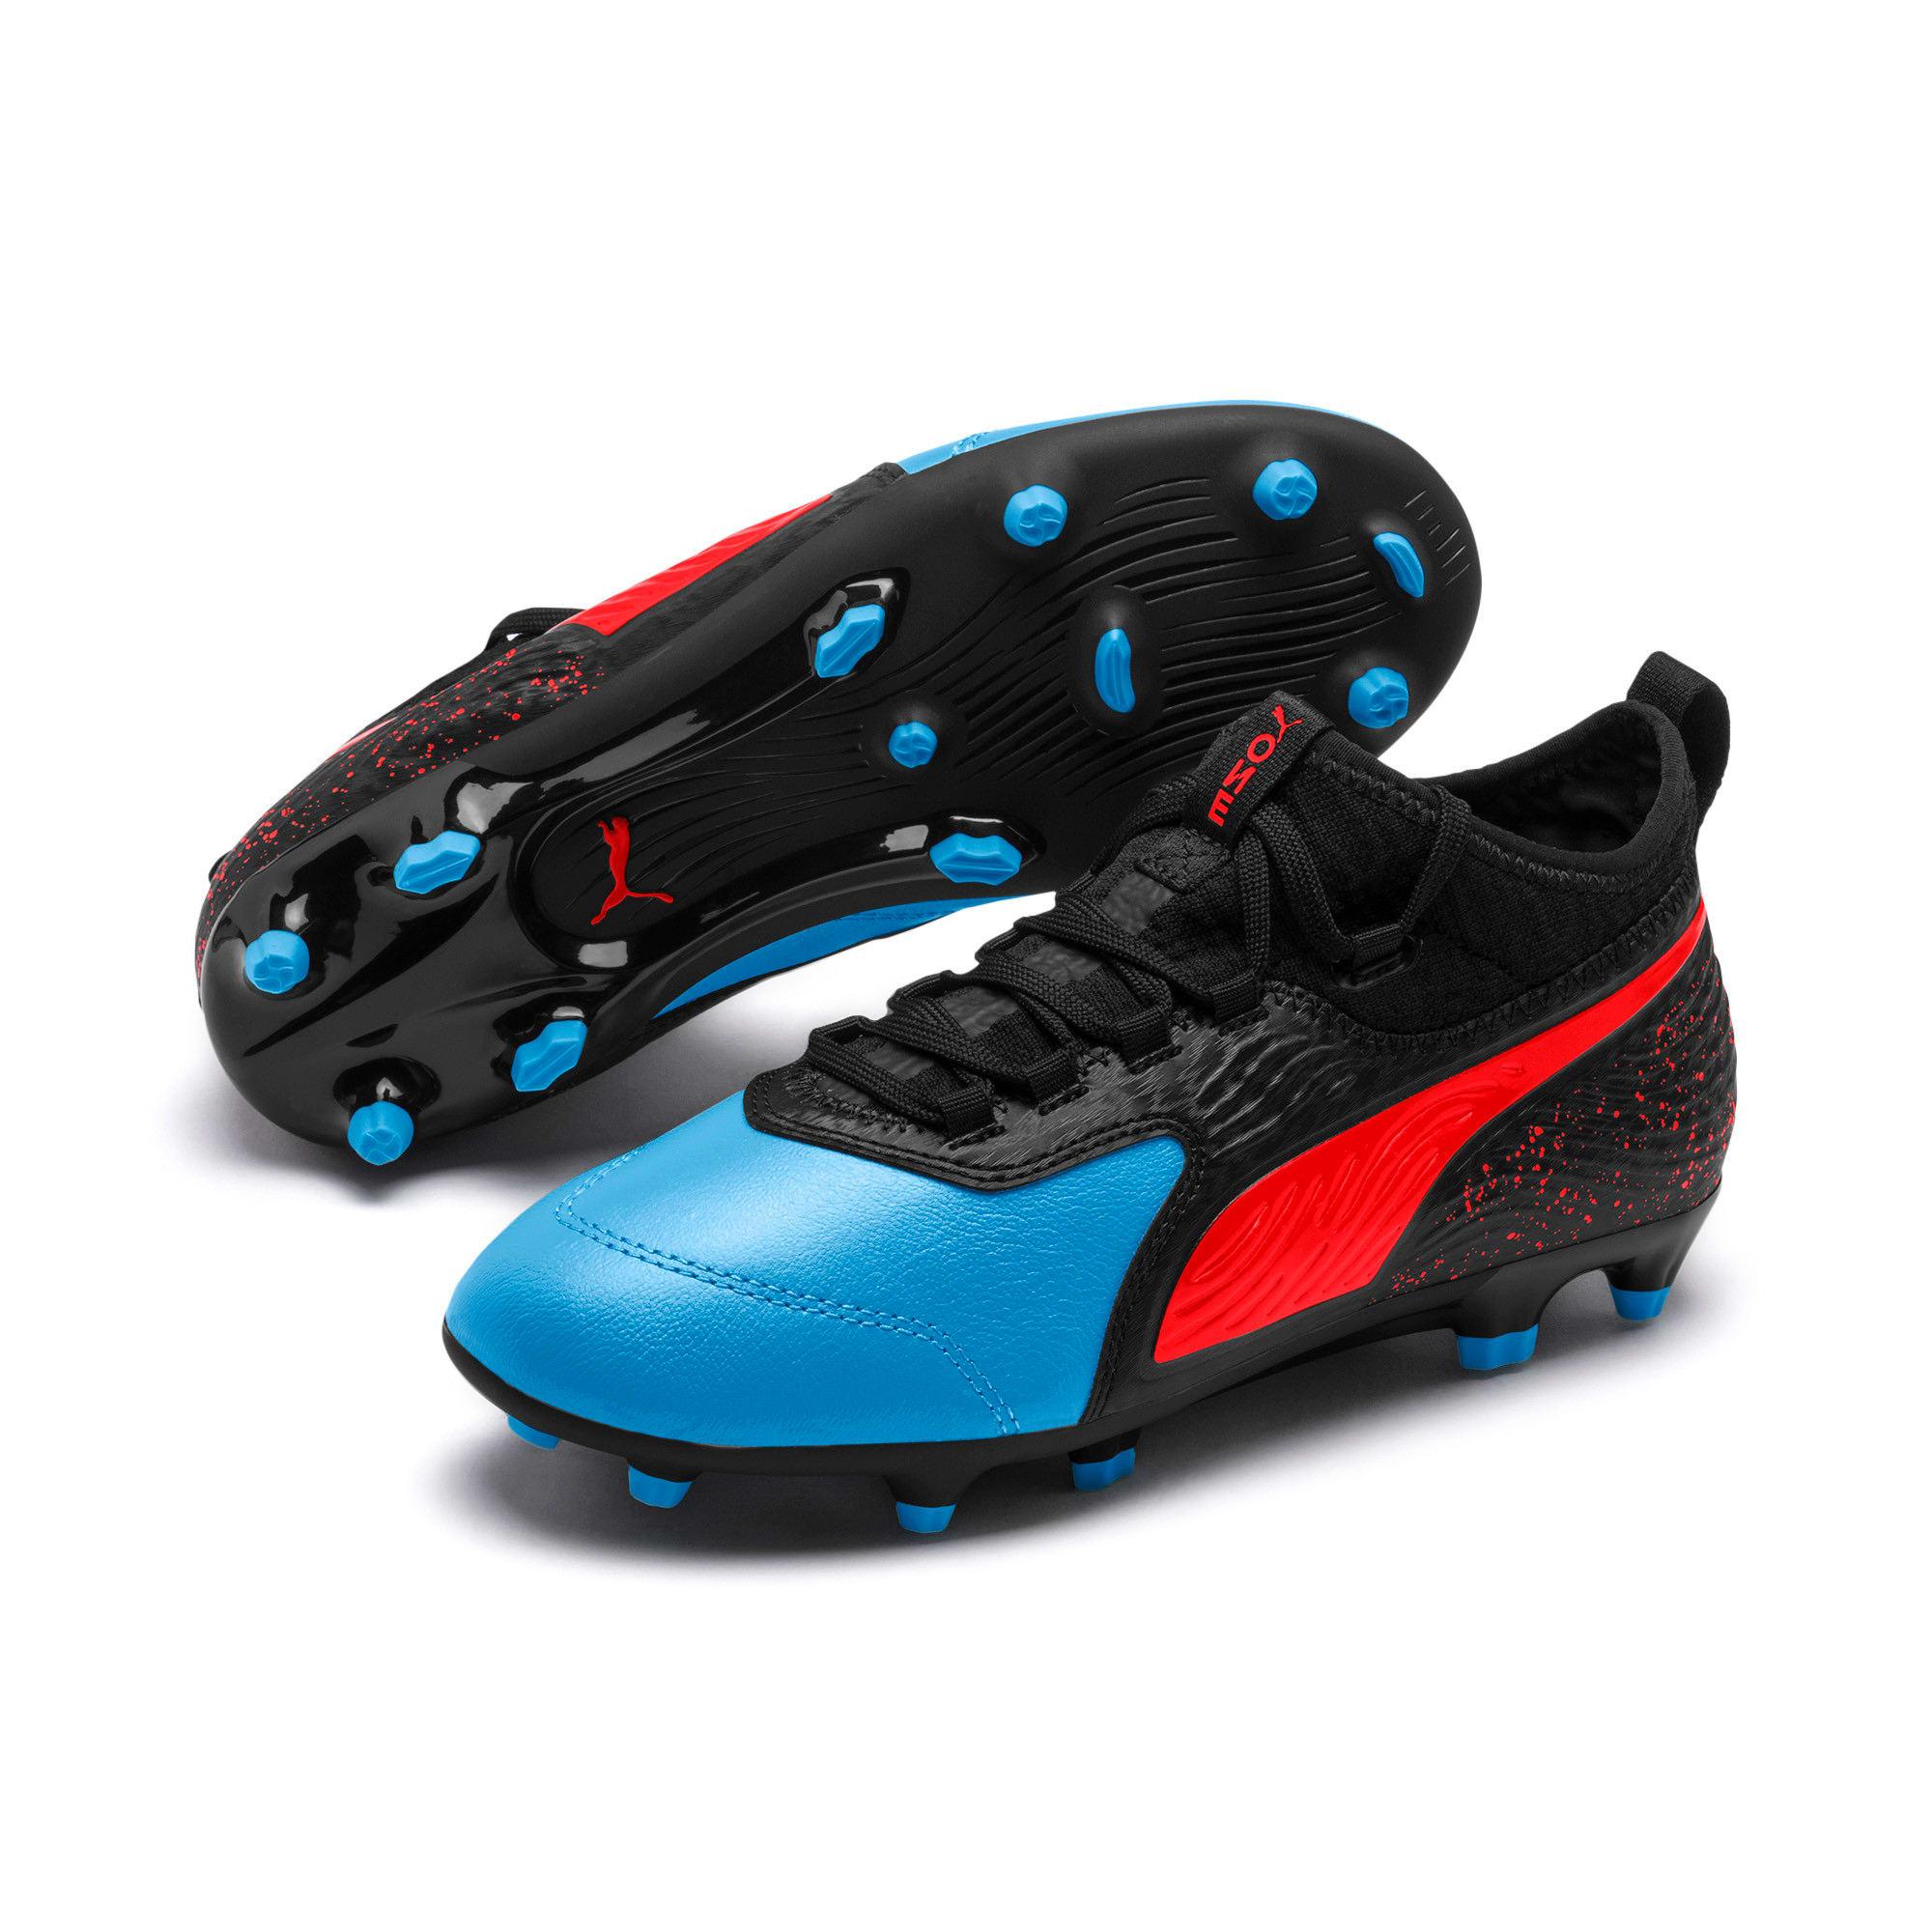 Thumbnail 2 of PUMA ONE 19.3 FG/AG Soccer Cleats JR, Bleu Azur-Red Blast-Black, medium